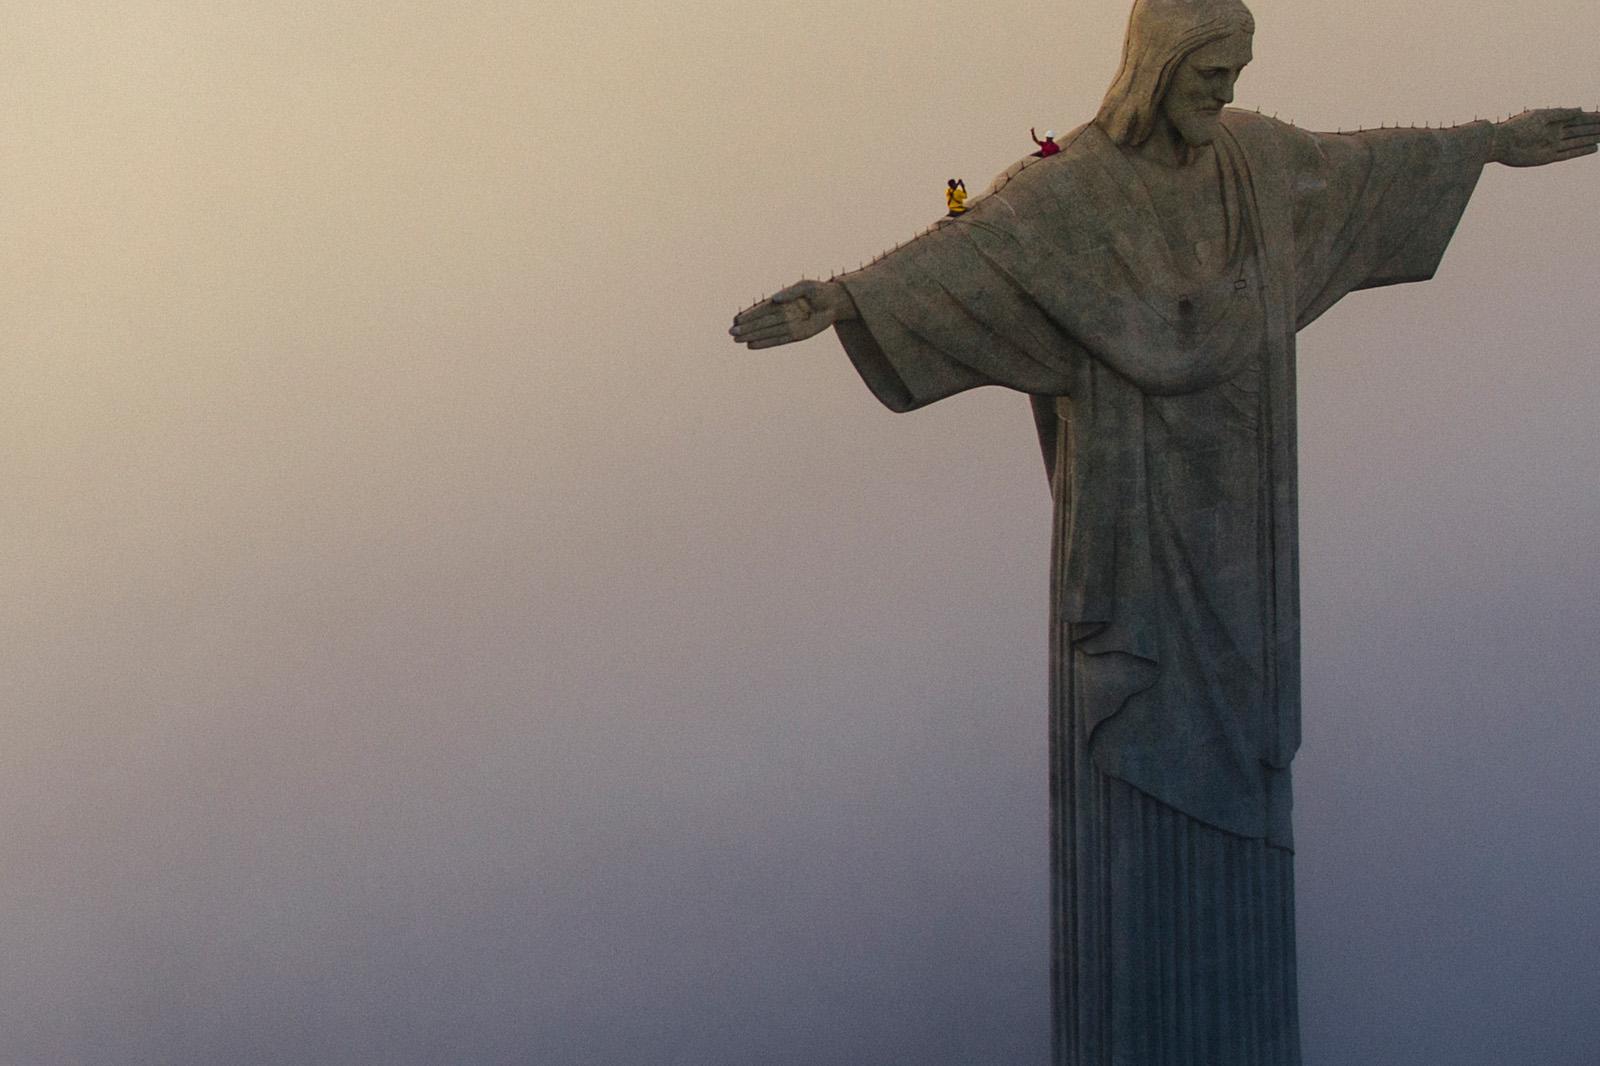 Rio_p28_29.jpg